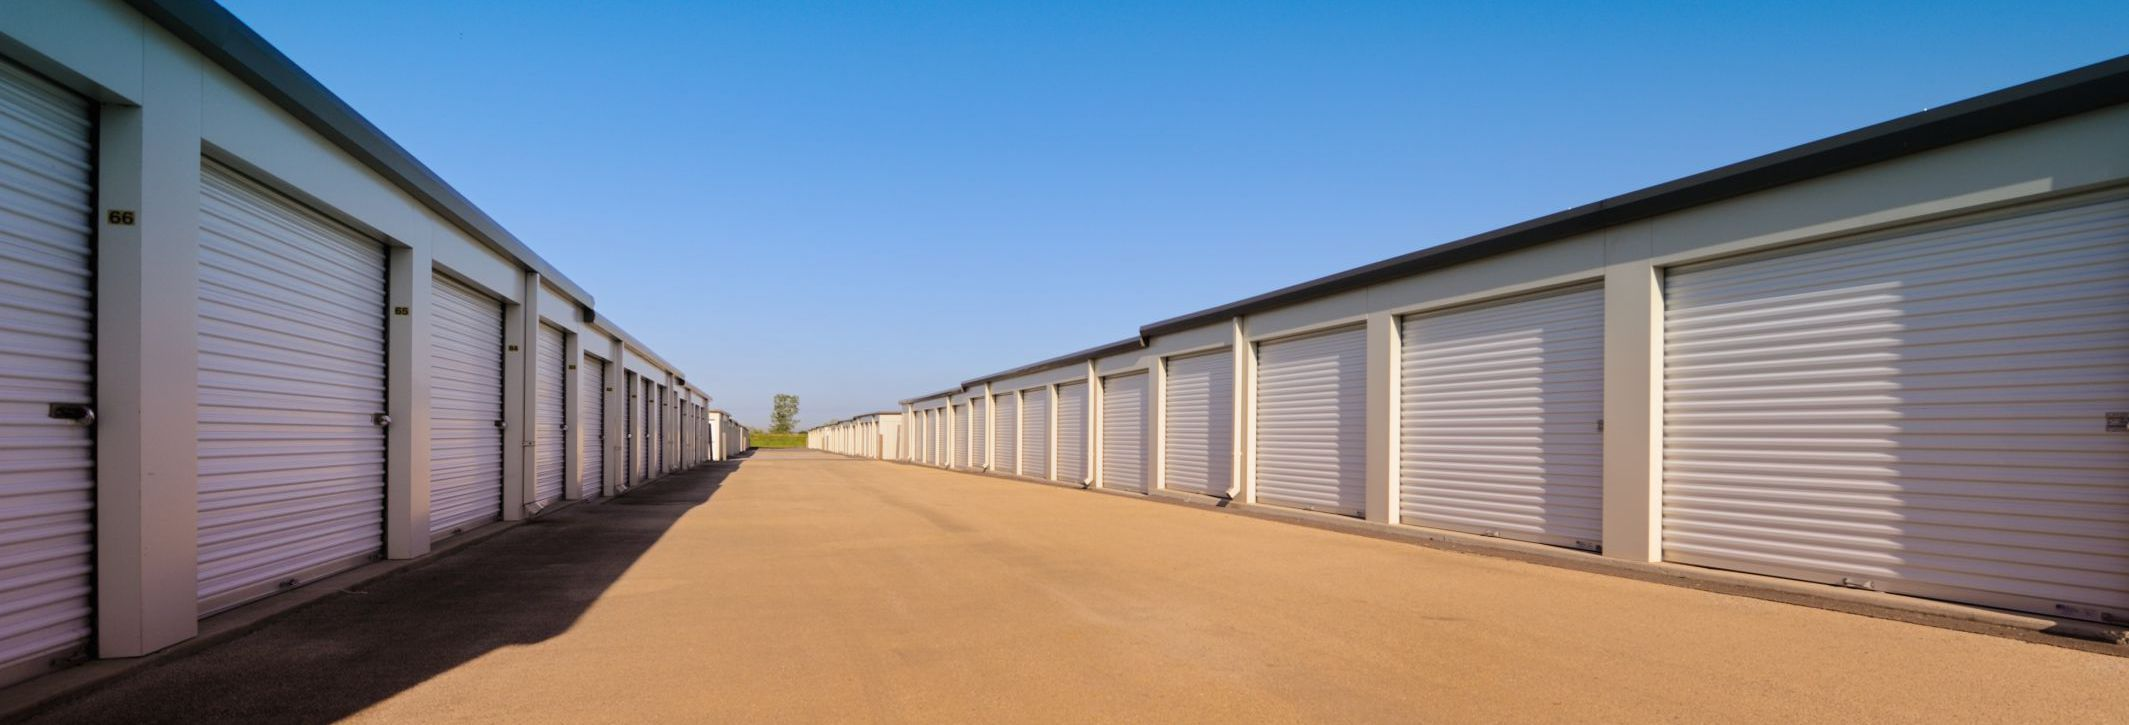 Self storage facility in Harrisburg, NC